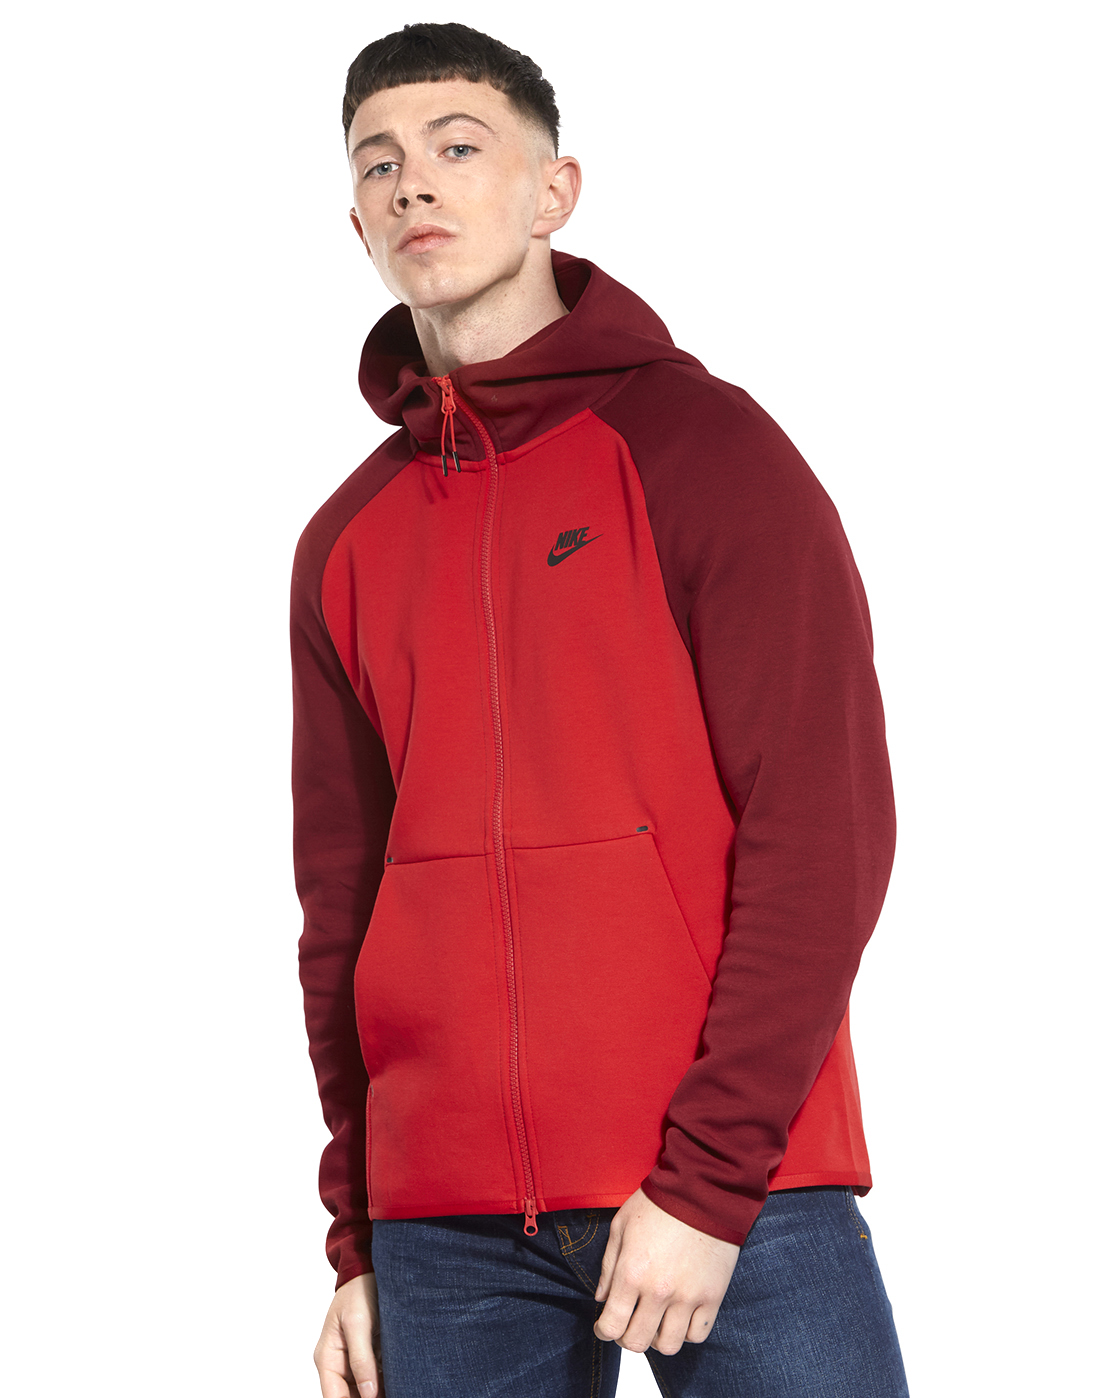 4e681bb5ad62 Men s Red Nike Tech Fleece Hoodie